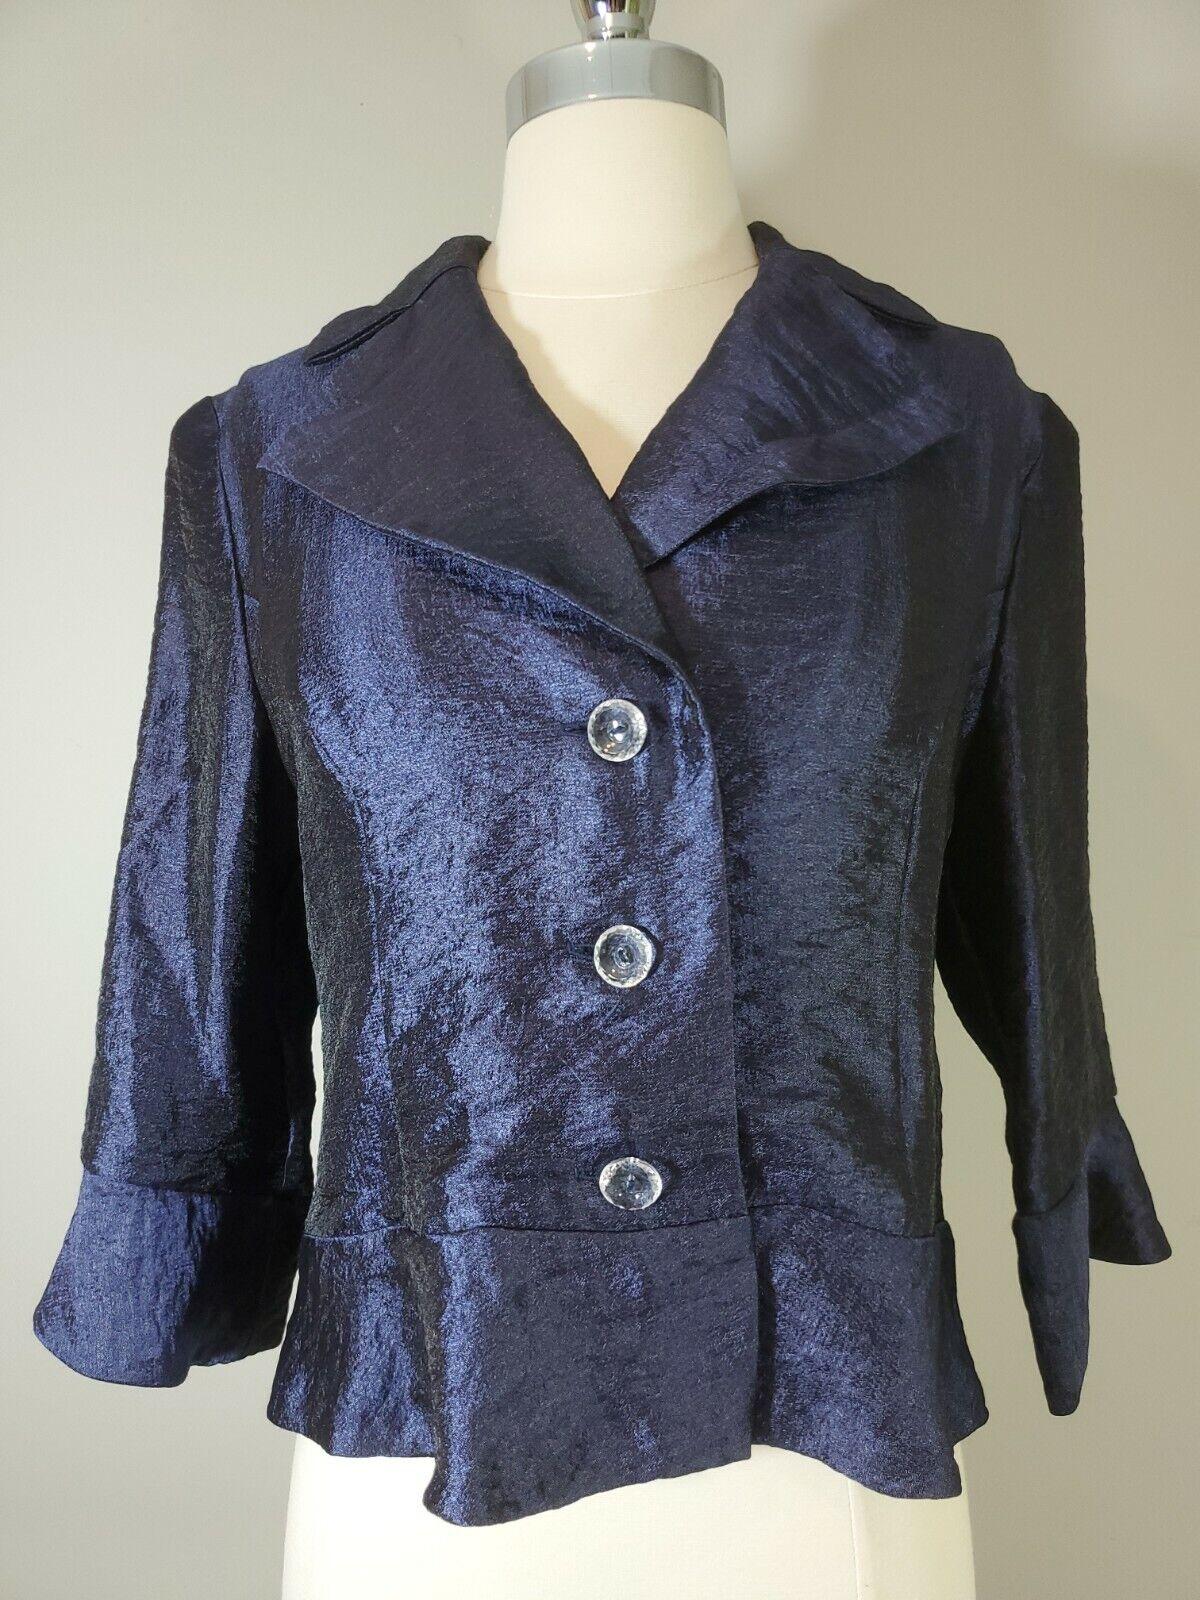 Ursula Of Switzerland Womans Blazer Top Navy Blue peplum 3/4 sleeve formal